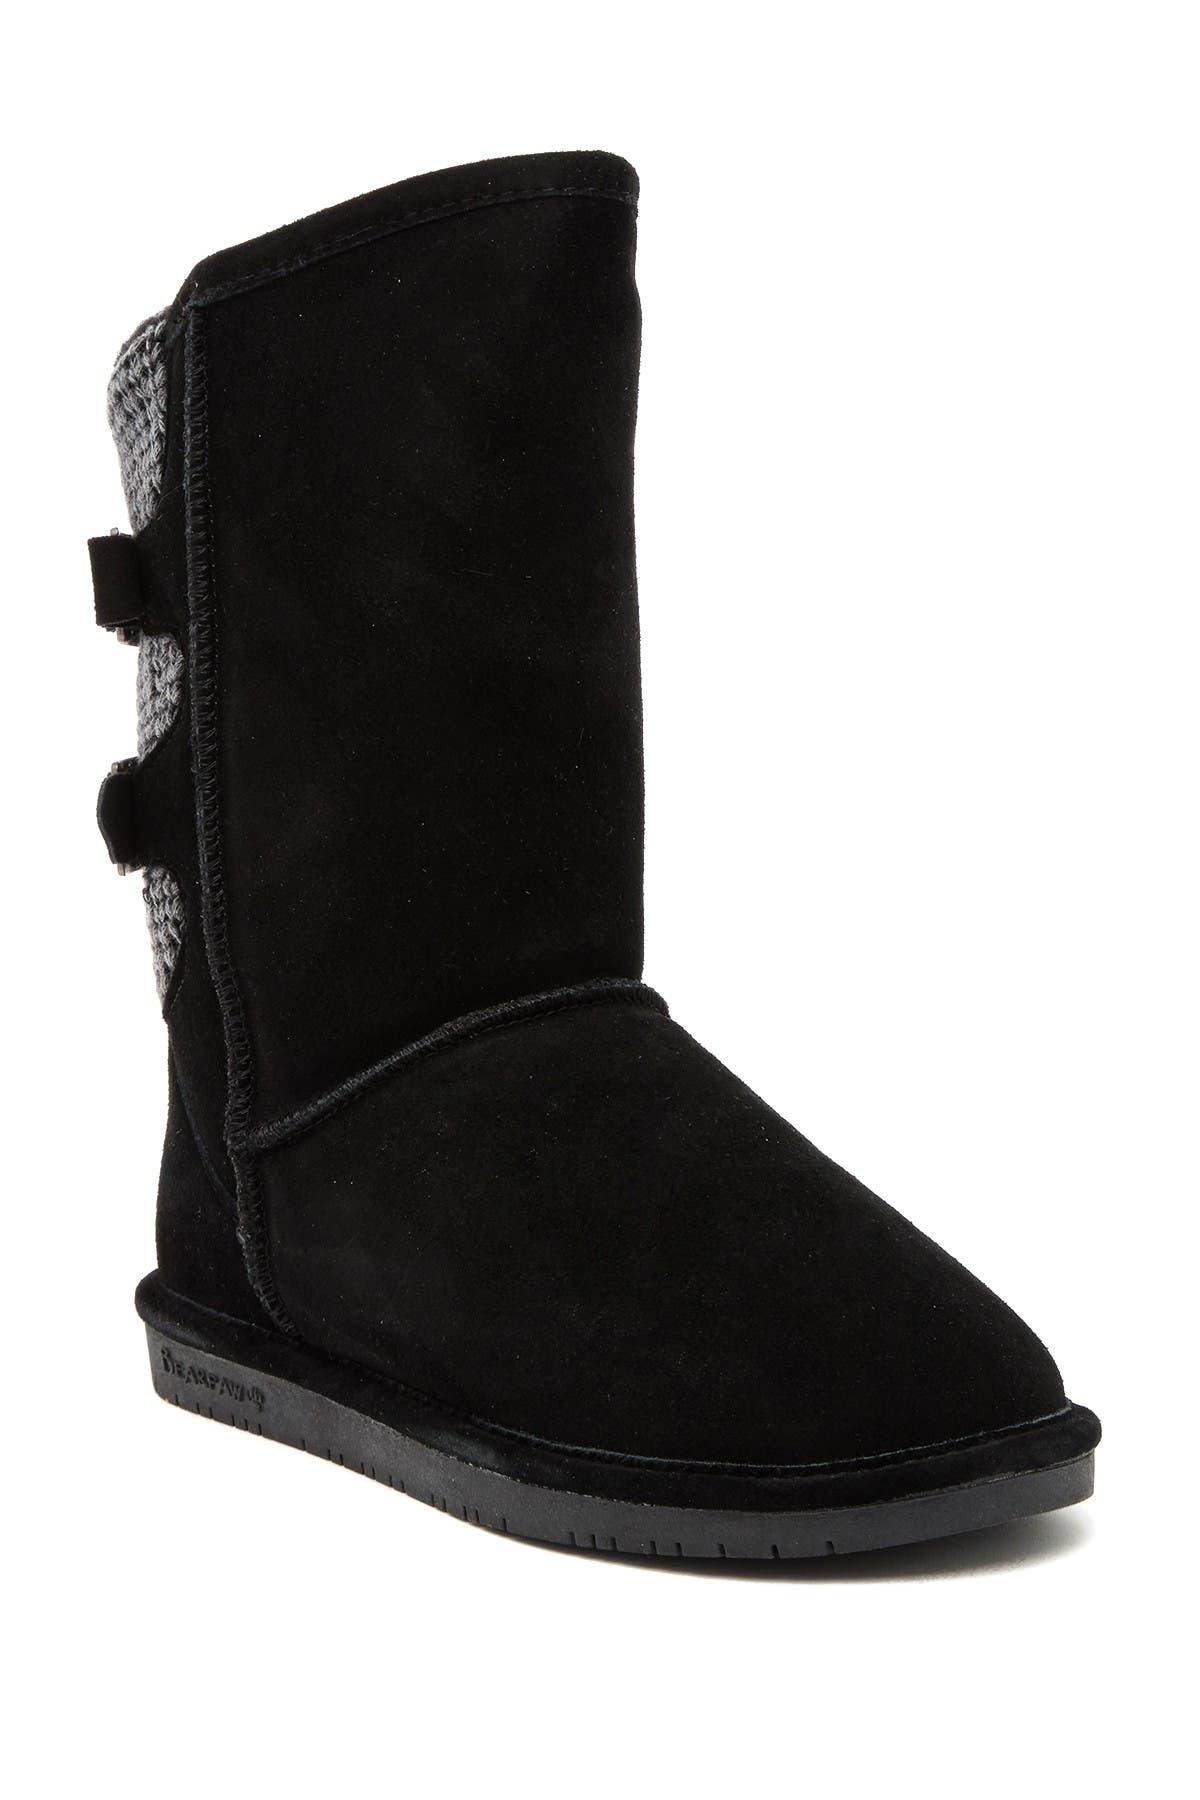 Image of BEARPAW Rue Genuine Sheepskin Lined Boot